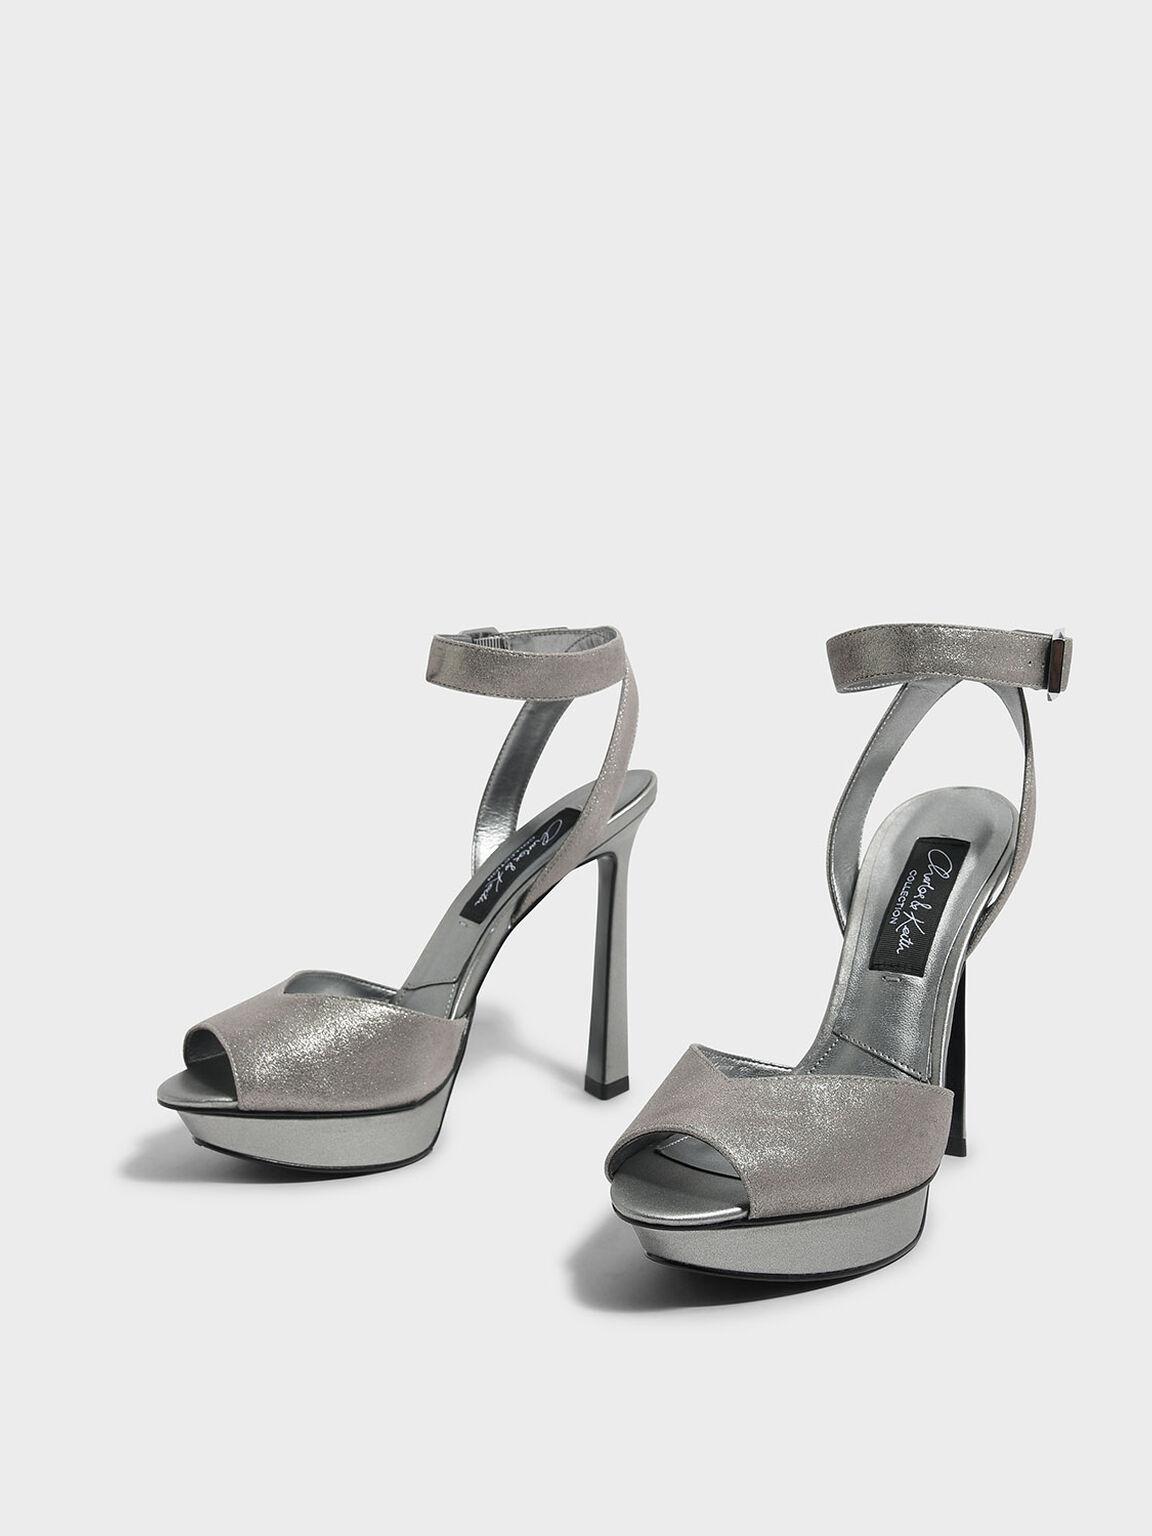 Peep Toe Leather Heels, Silver, hi-res